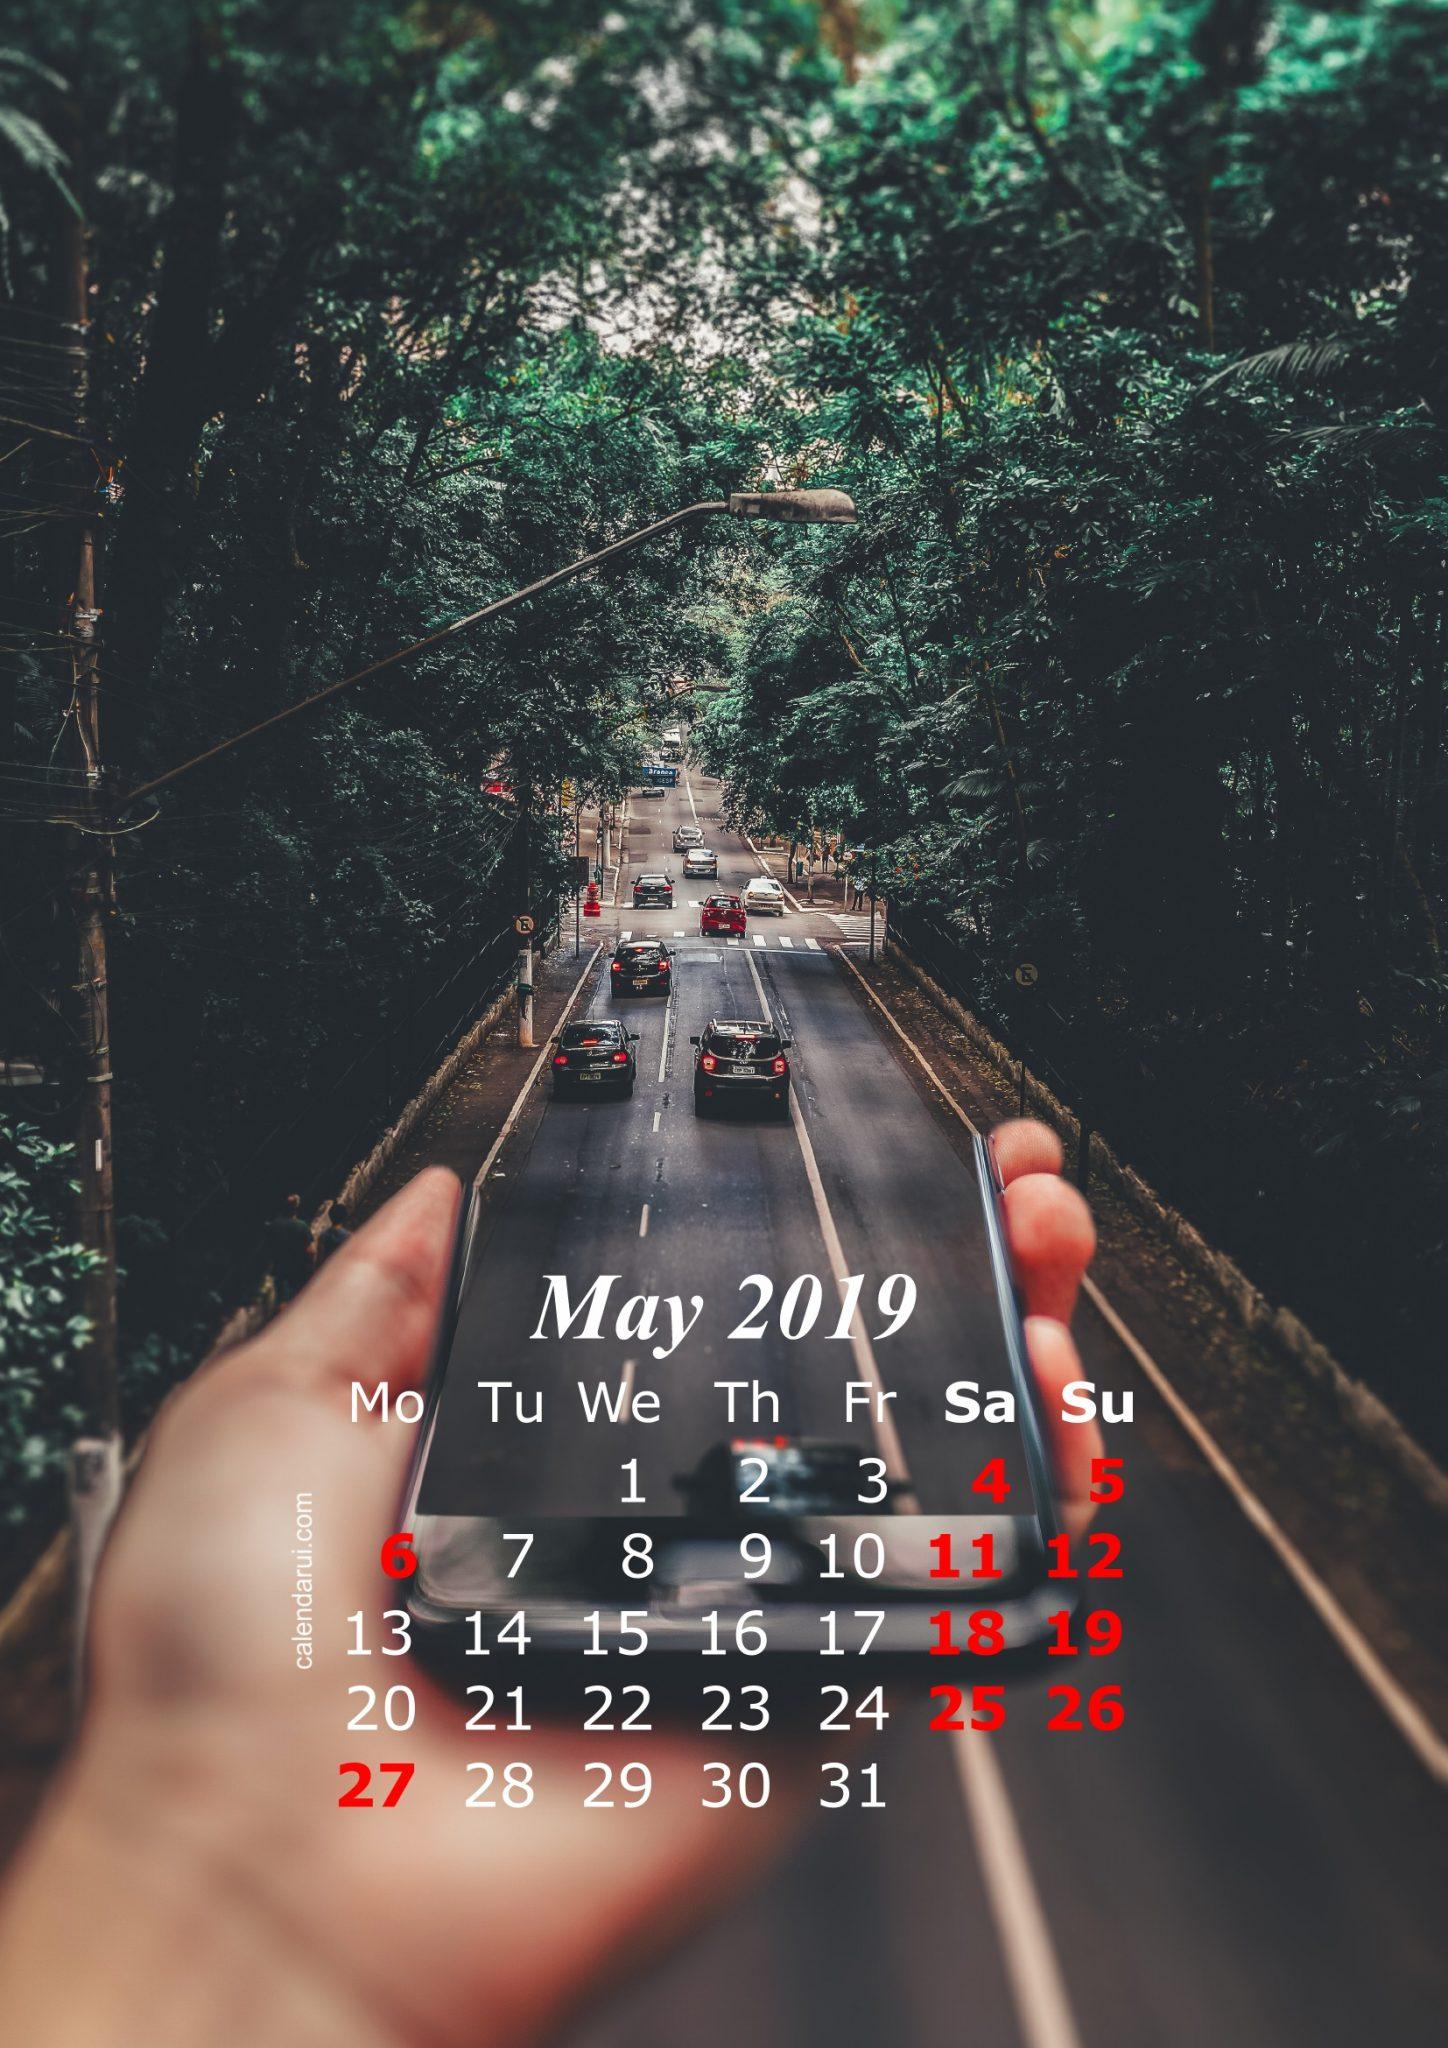 May 2019 Calendar Iphone Wallpaper